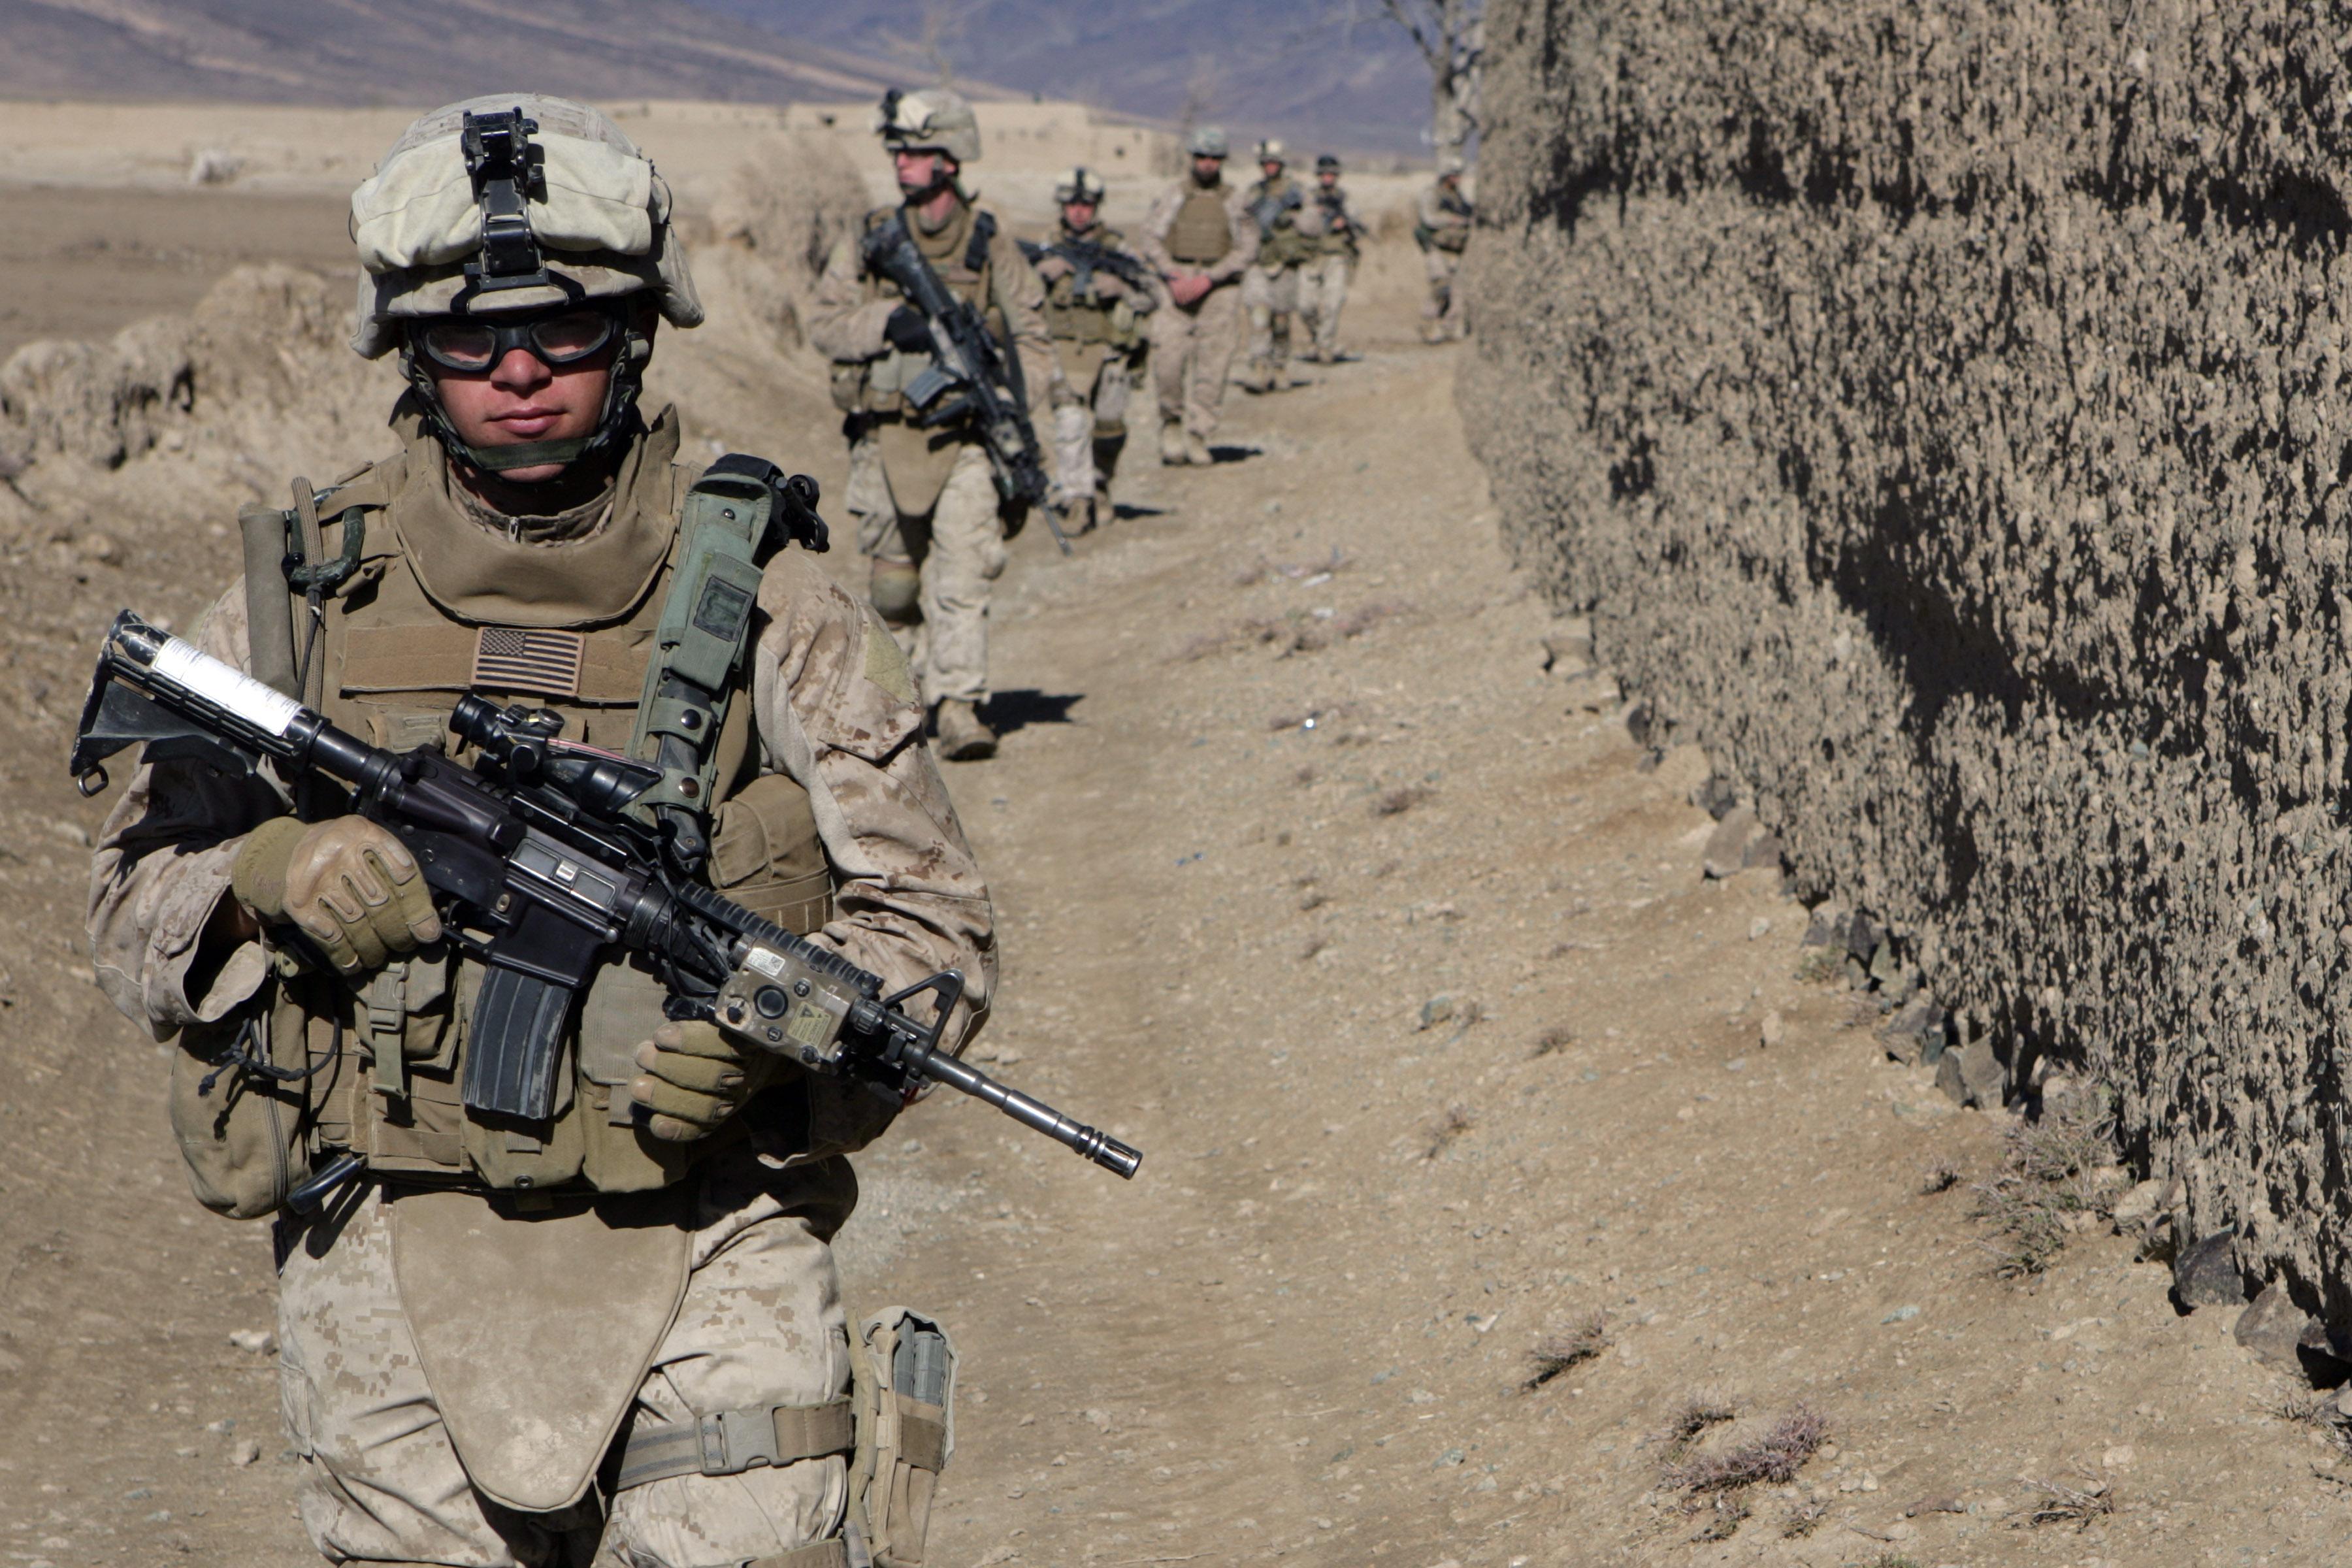 File:Defense.gov News Photo 081222-M-6159T-035.jpg - Wikimedia Commons